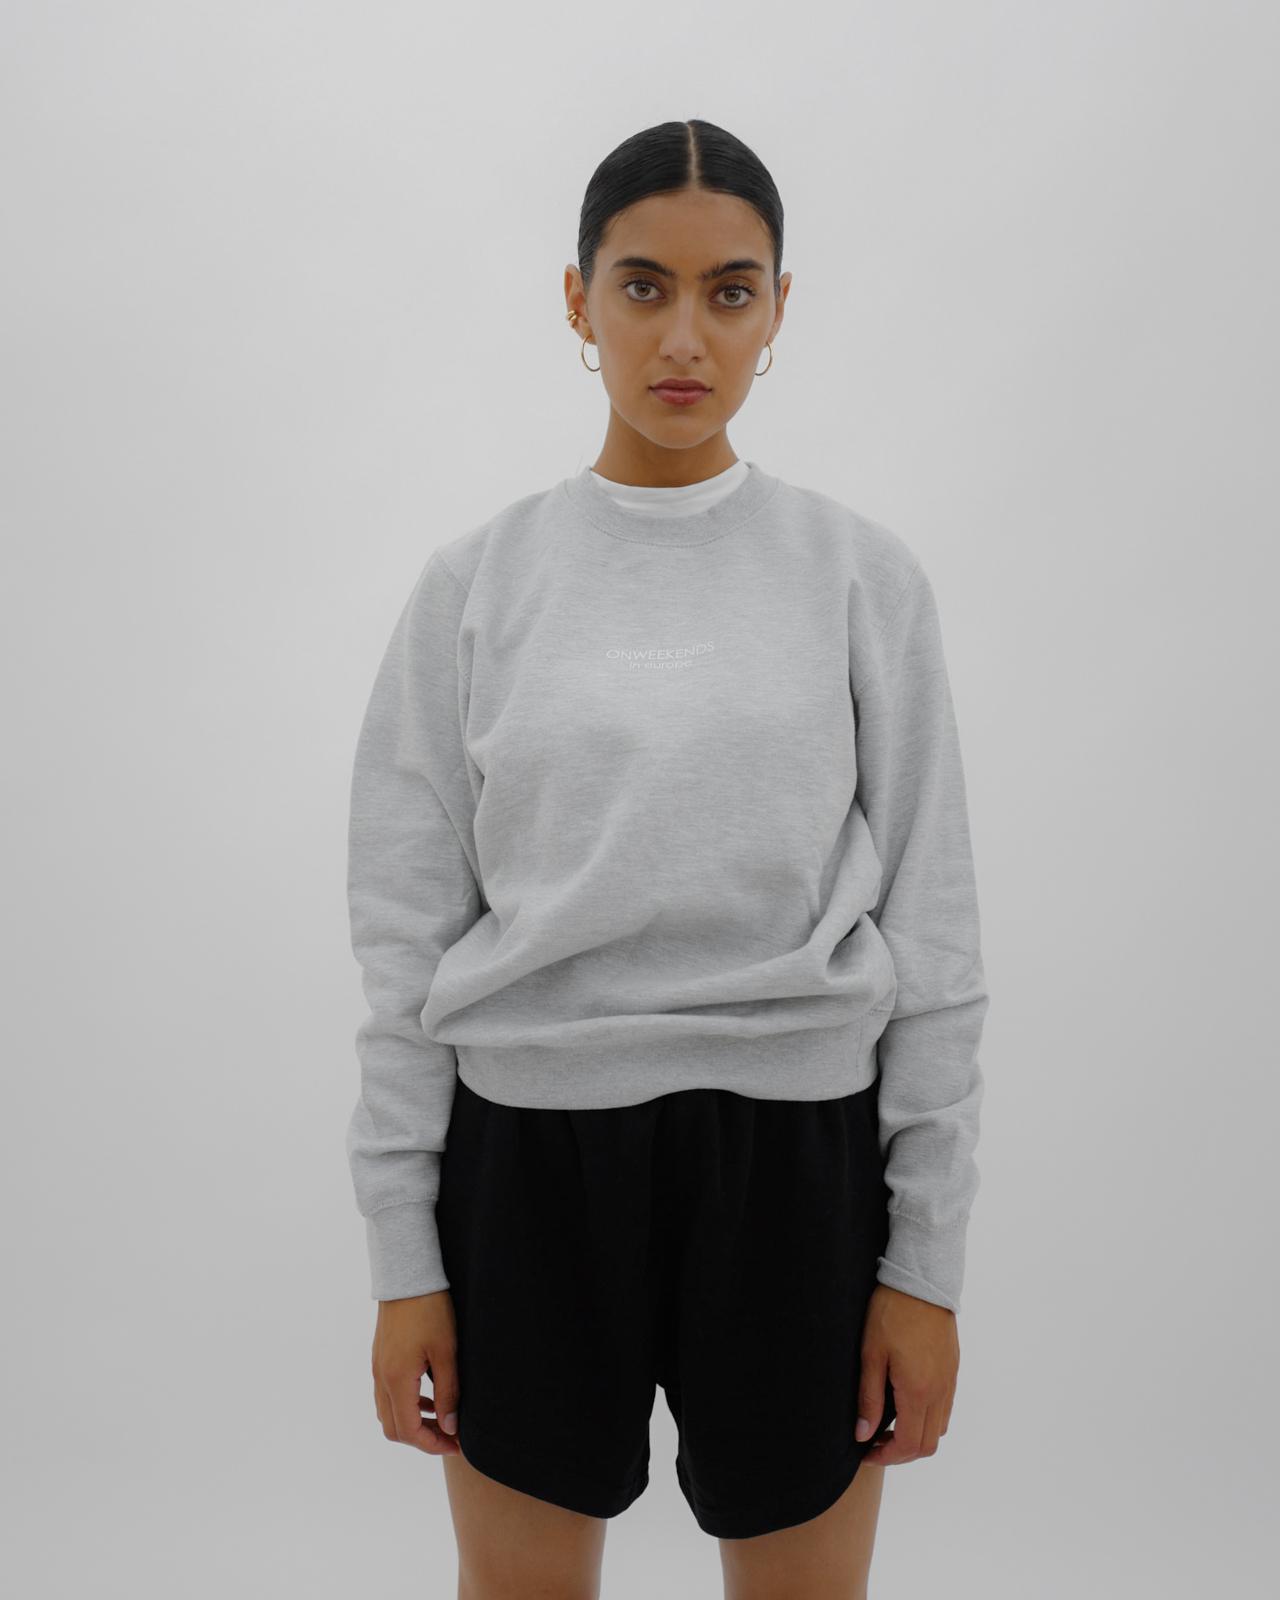 Varianten: in europe Pullover Grau